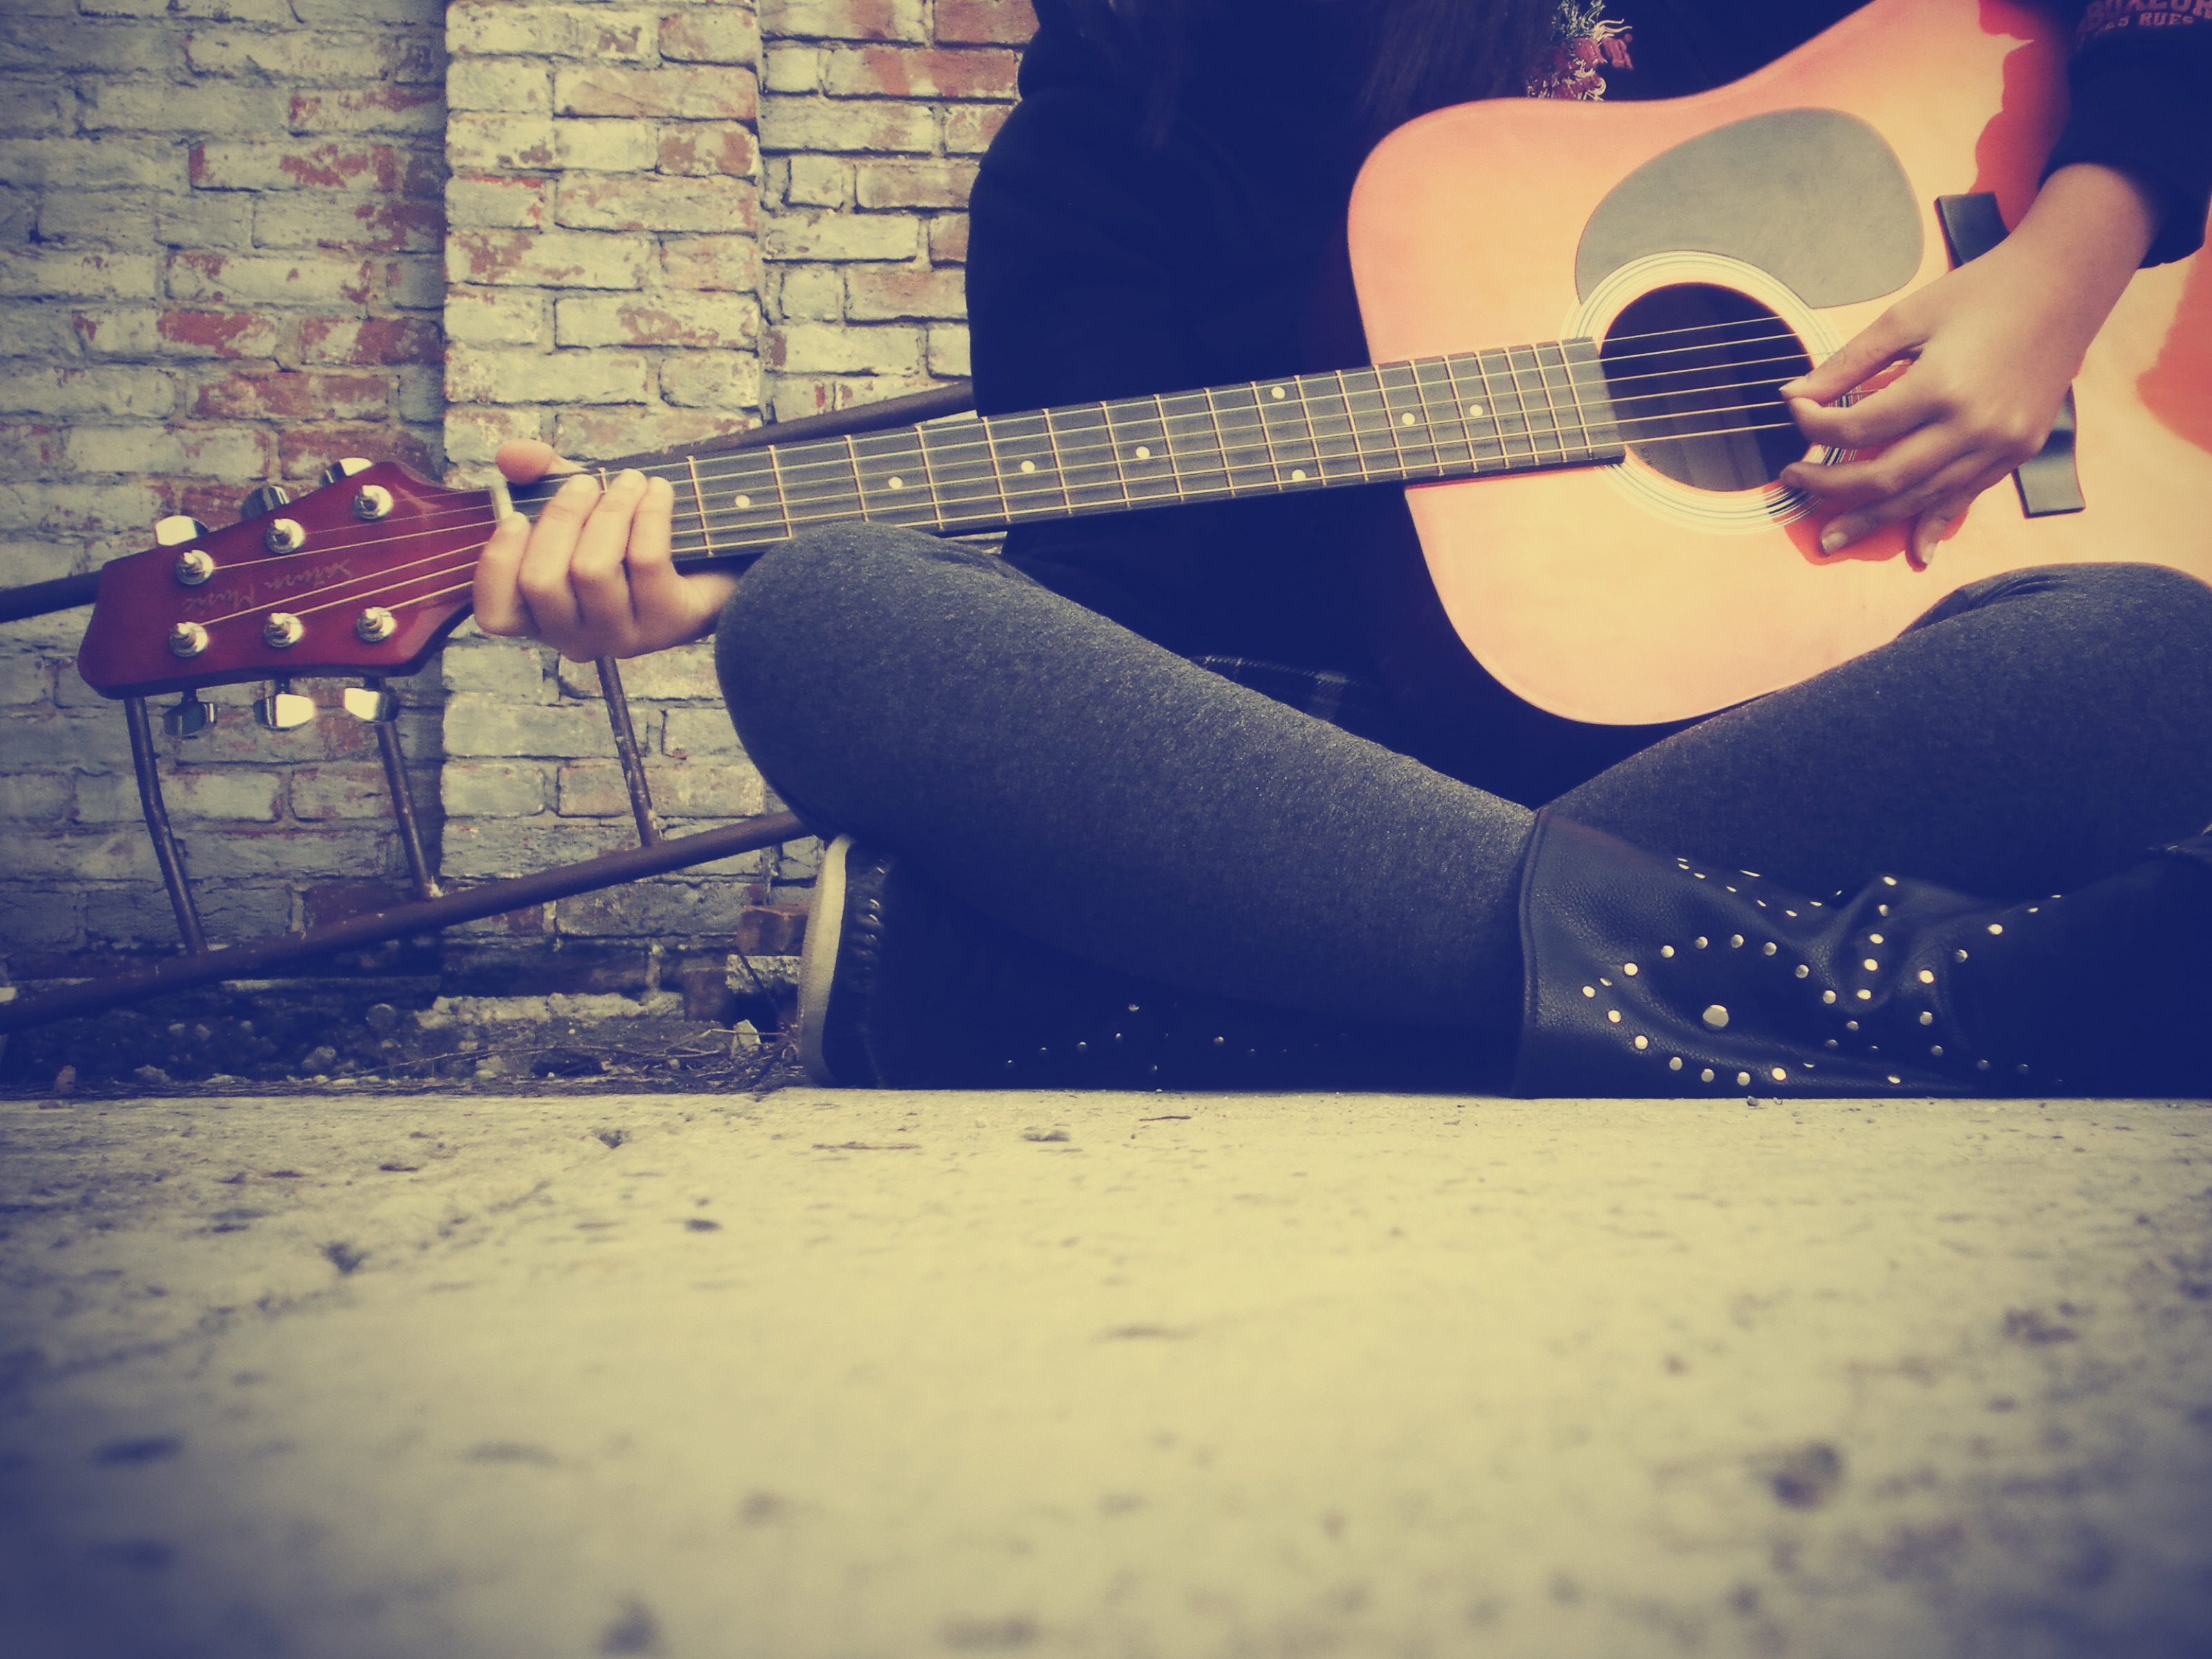 Image: Girl, sitting, guitar, strings, playing, brick wall